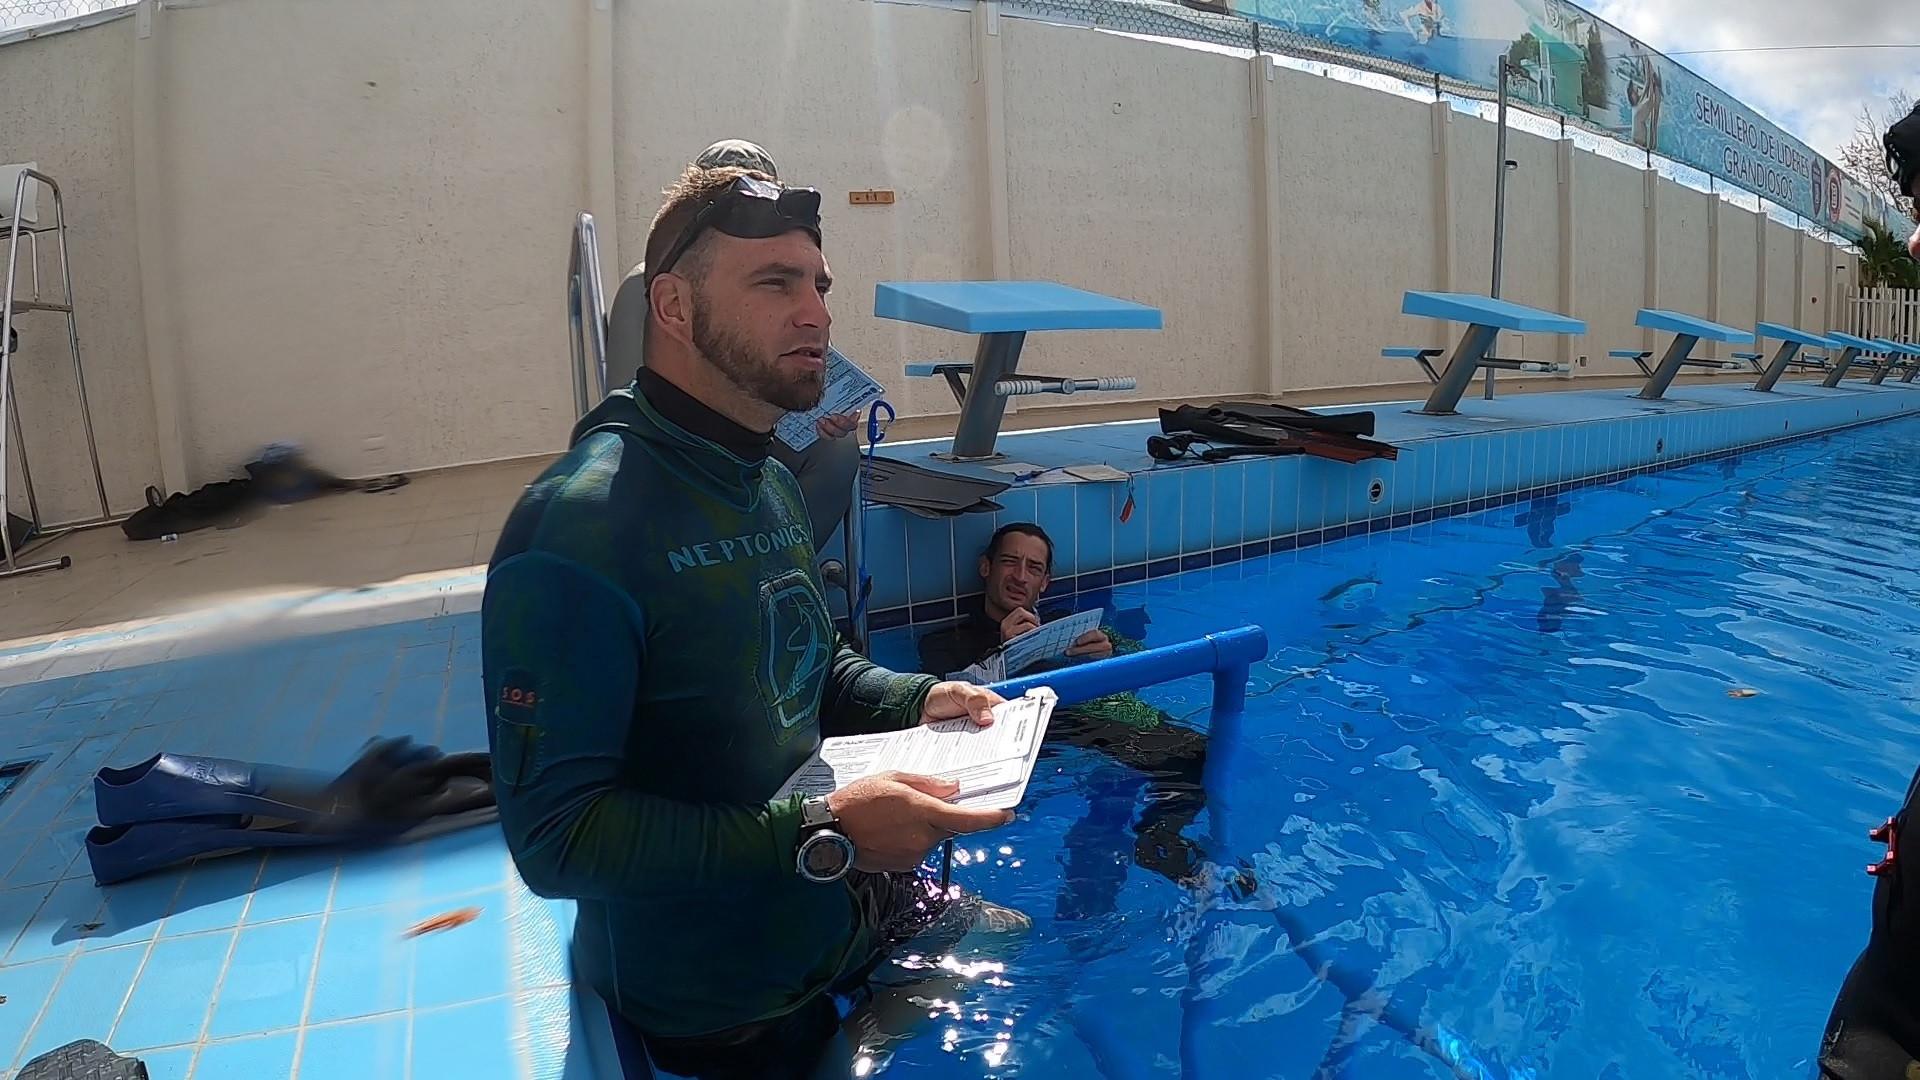 Freedive instructor 6-7 days